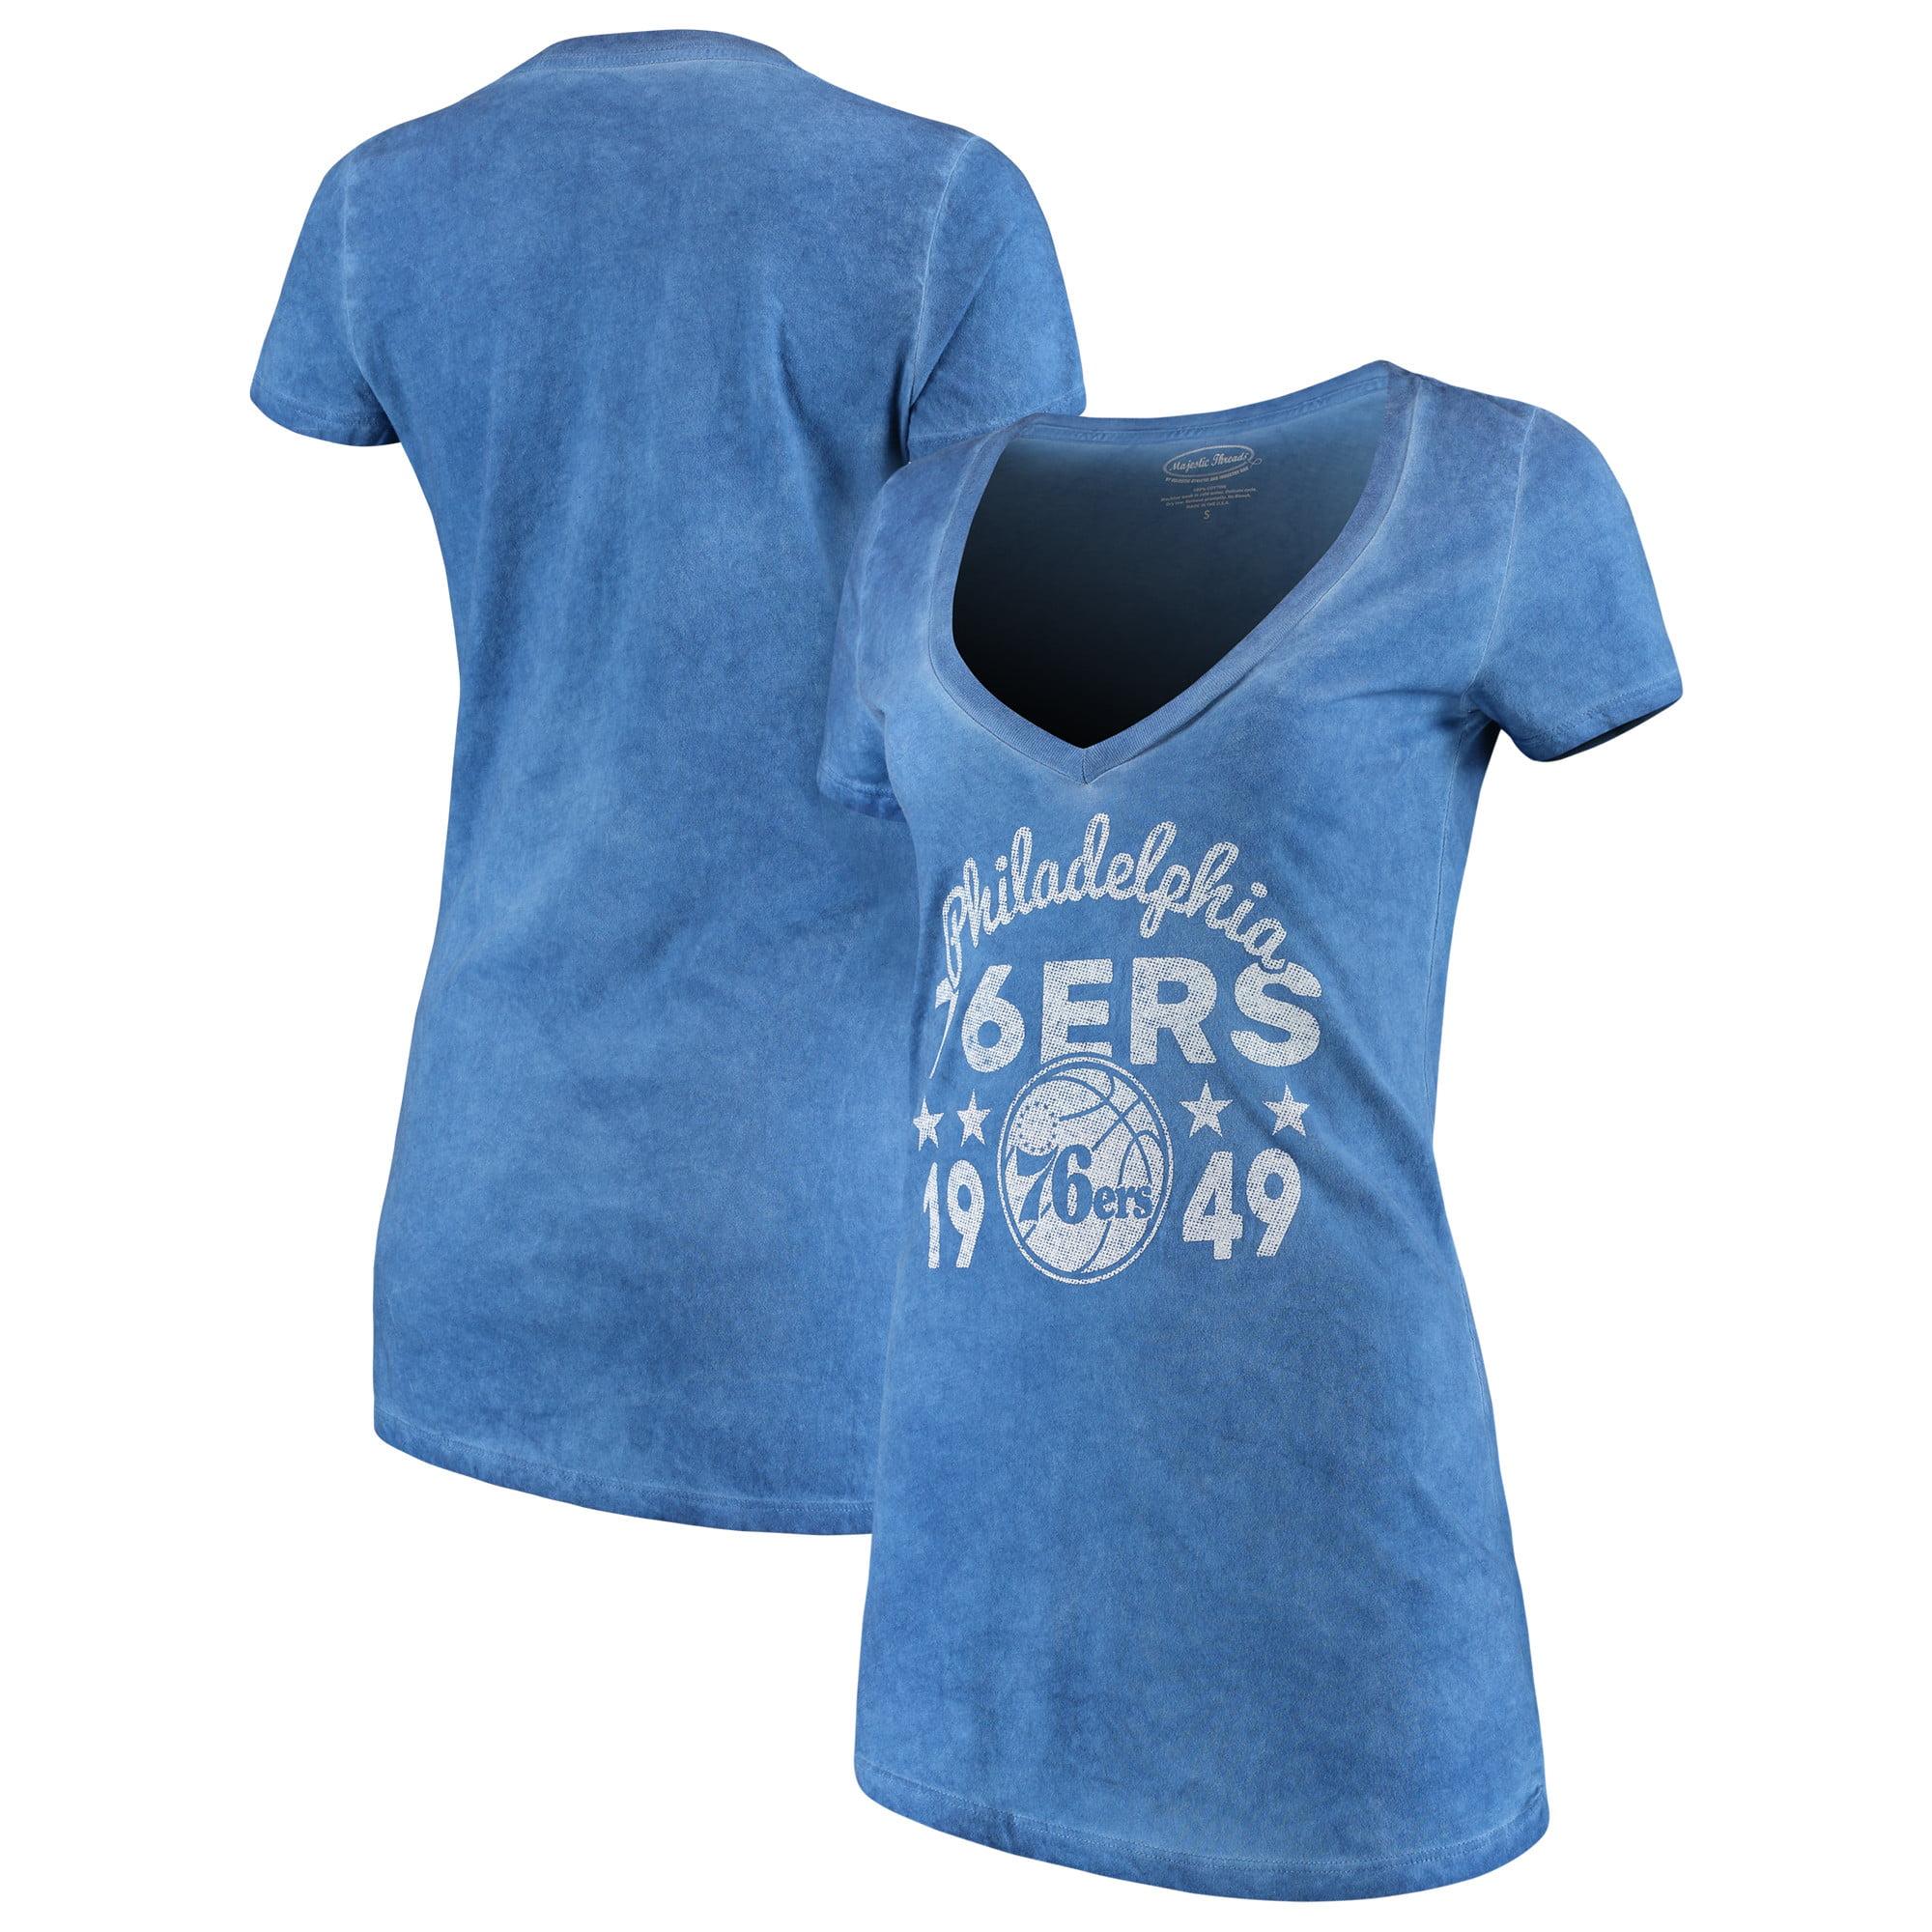 Philadelphia 76ers Majestic Threads Women's City Over Pop Premium V-Neck T-Shirt - Royal